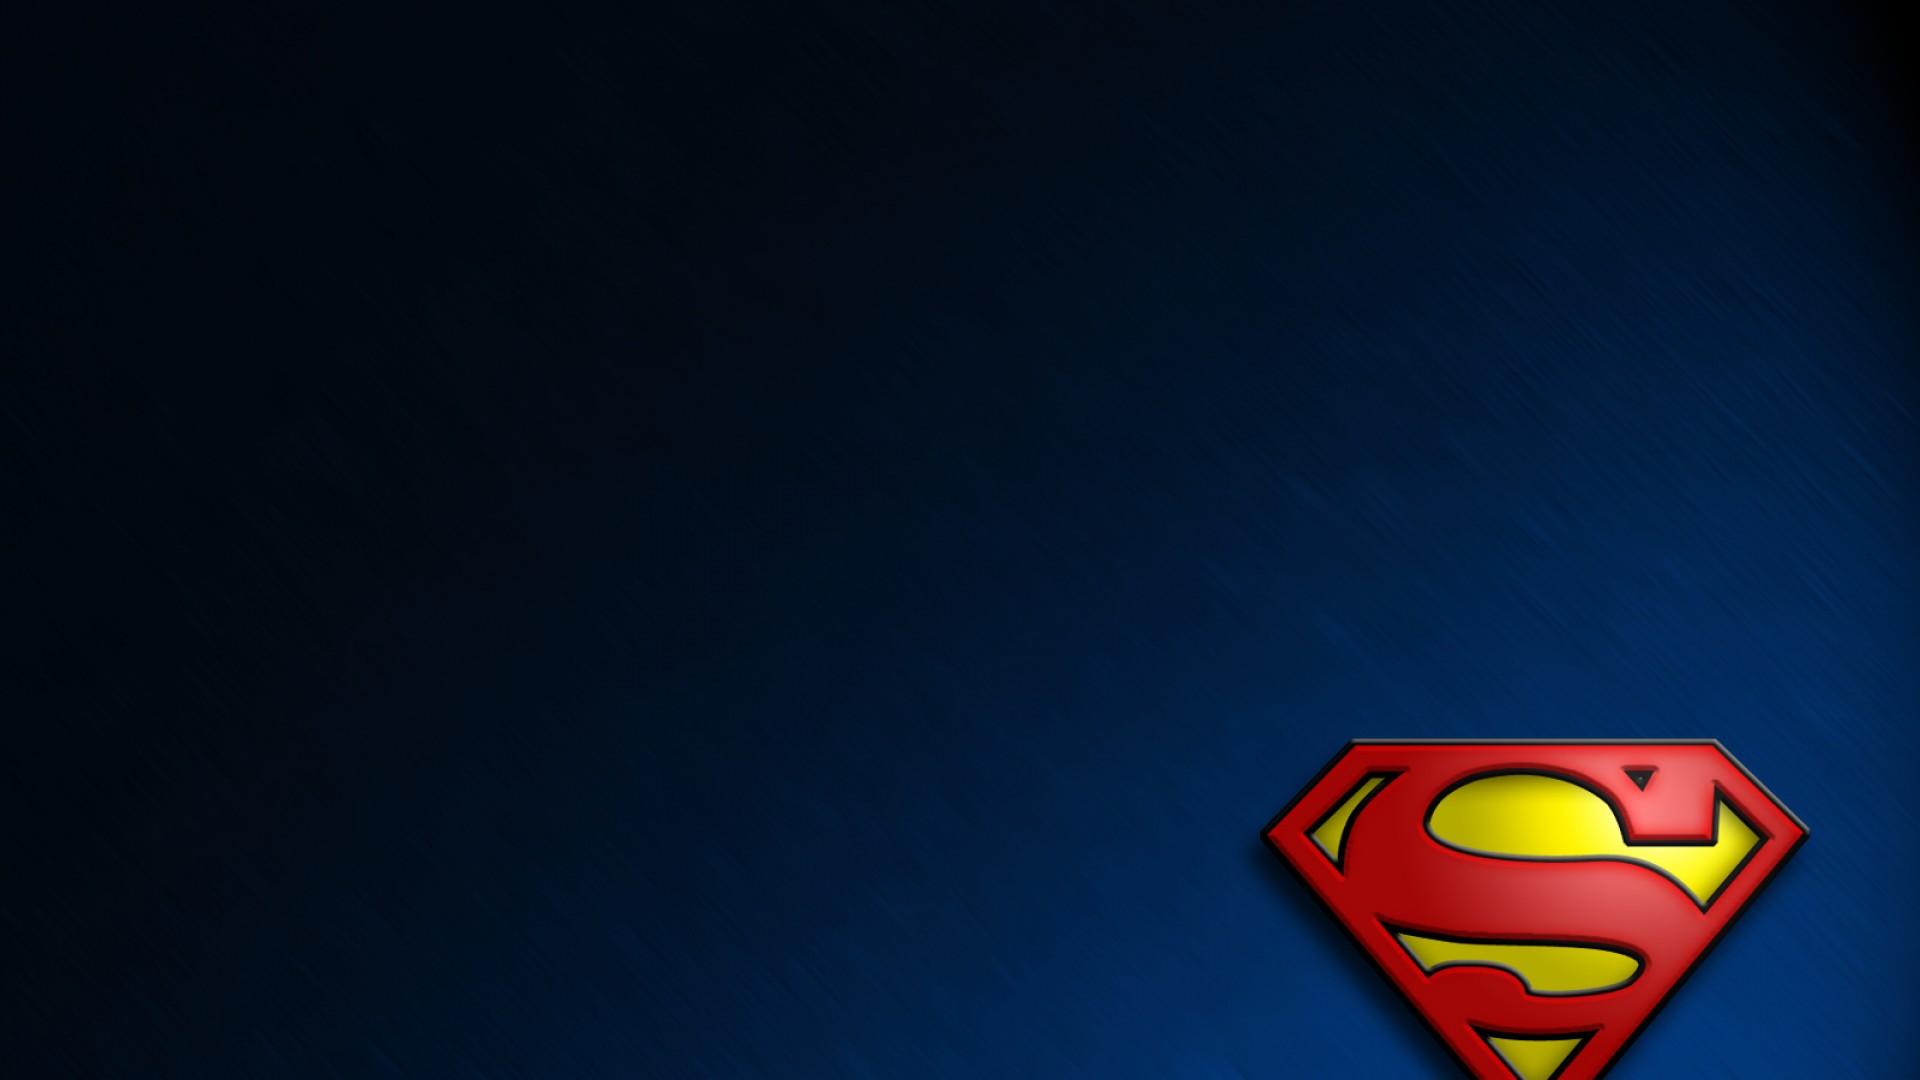 Superman superman hero cartoon  1920x1080jpg 1920x1080